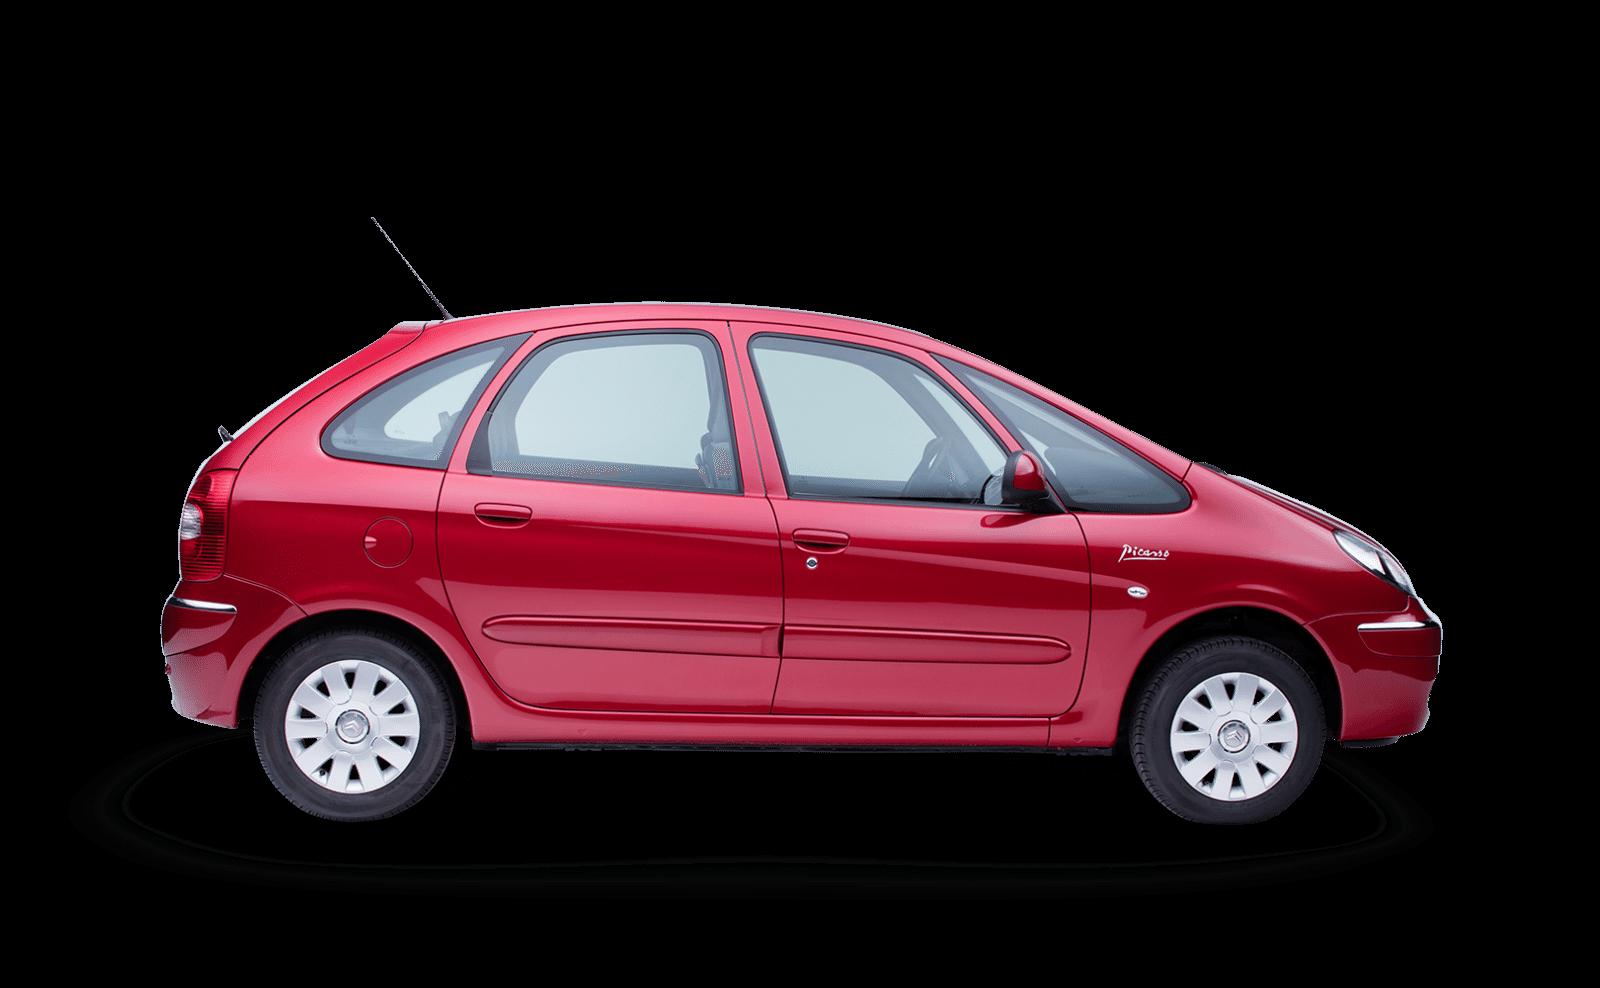 Viatura Citroen - Xsara Picasso - 2006 - Diesel - Vendida ...